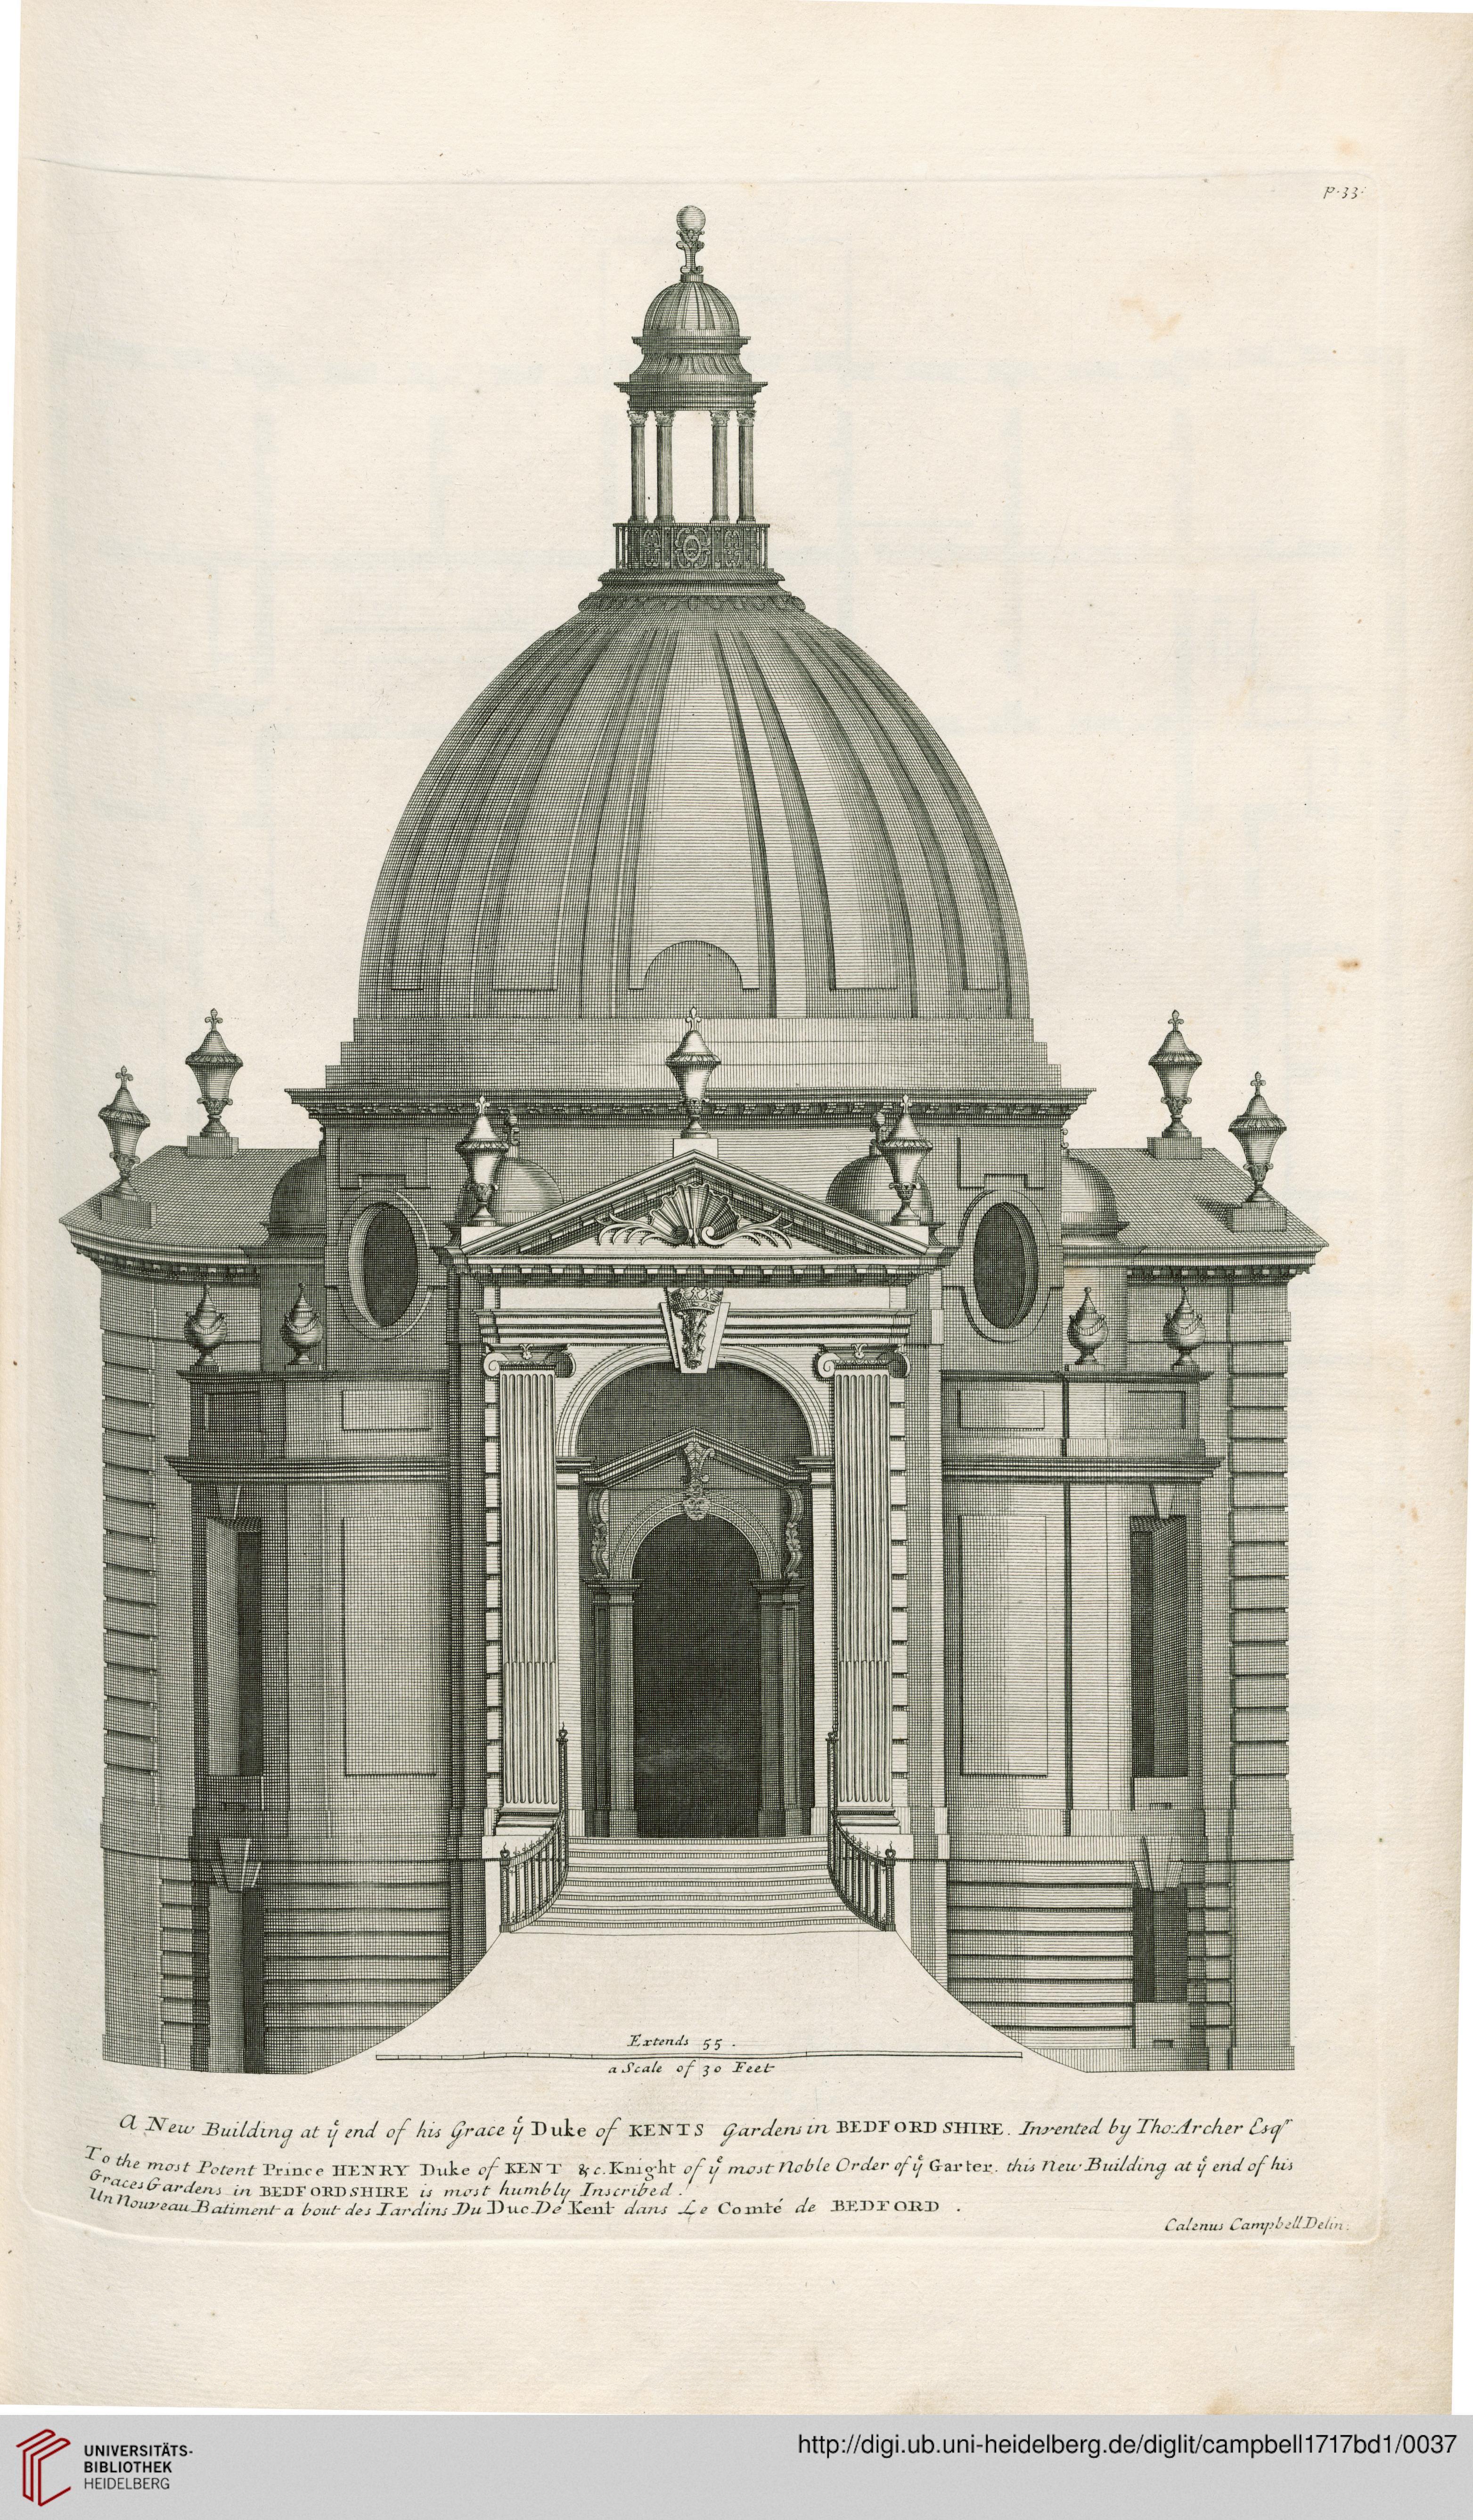 universitätsbibliothek heidelberg https://en.wikipedia/wiki